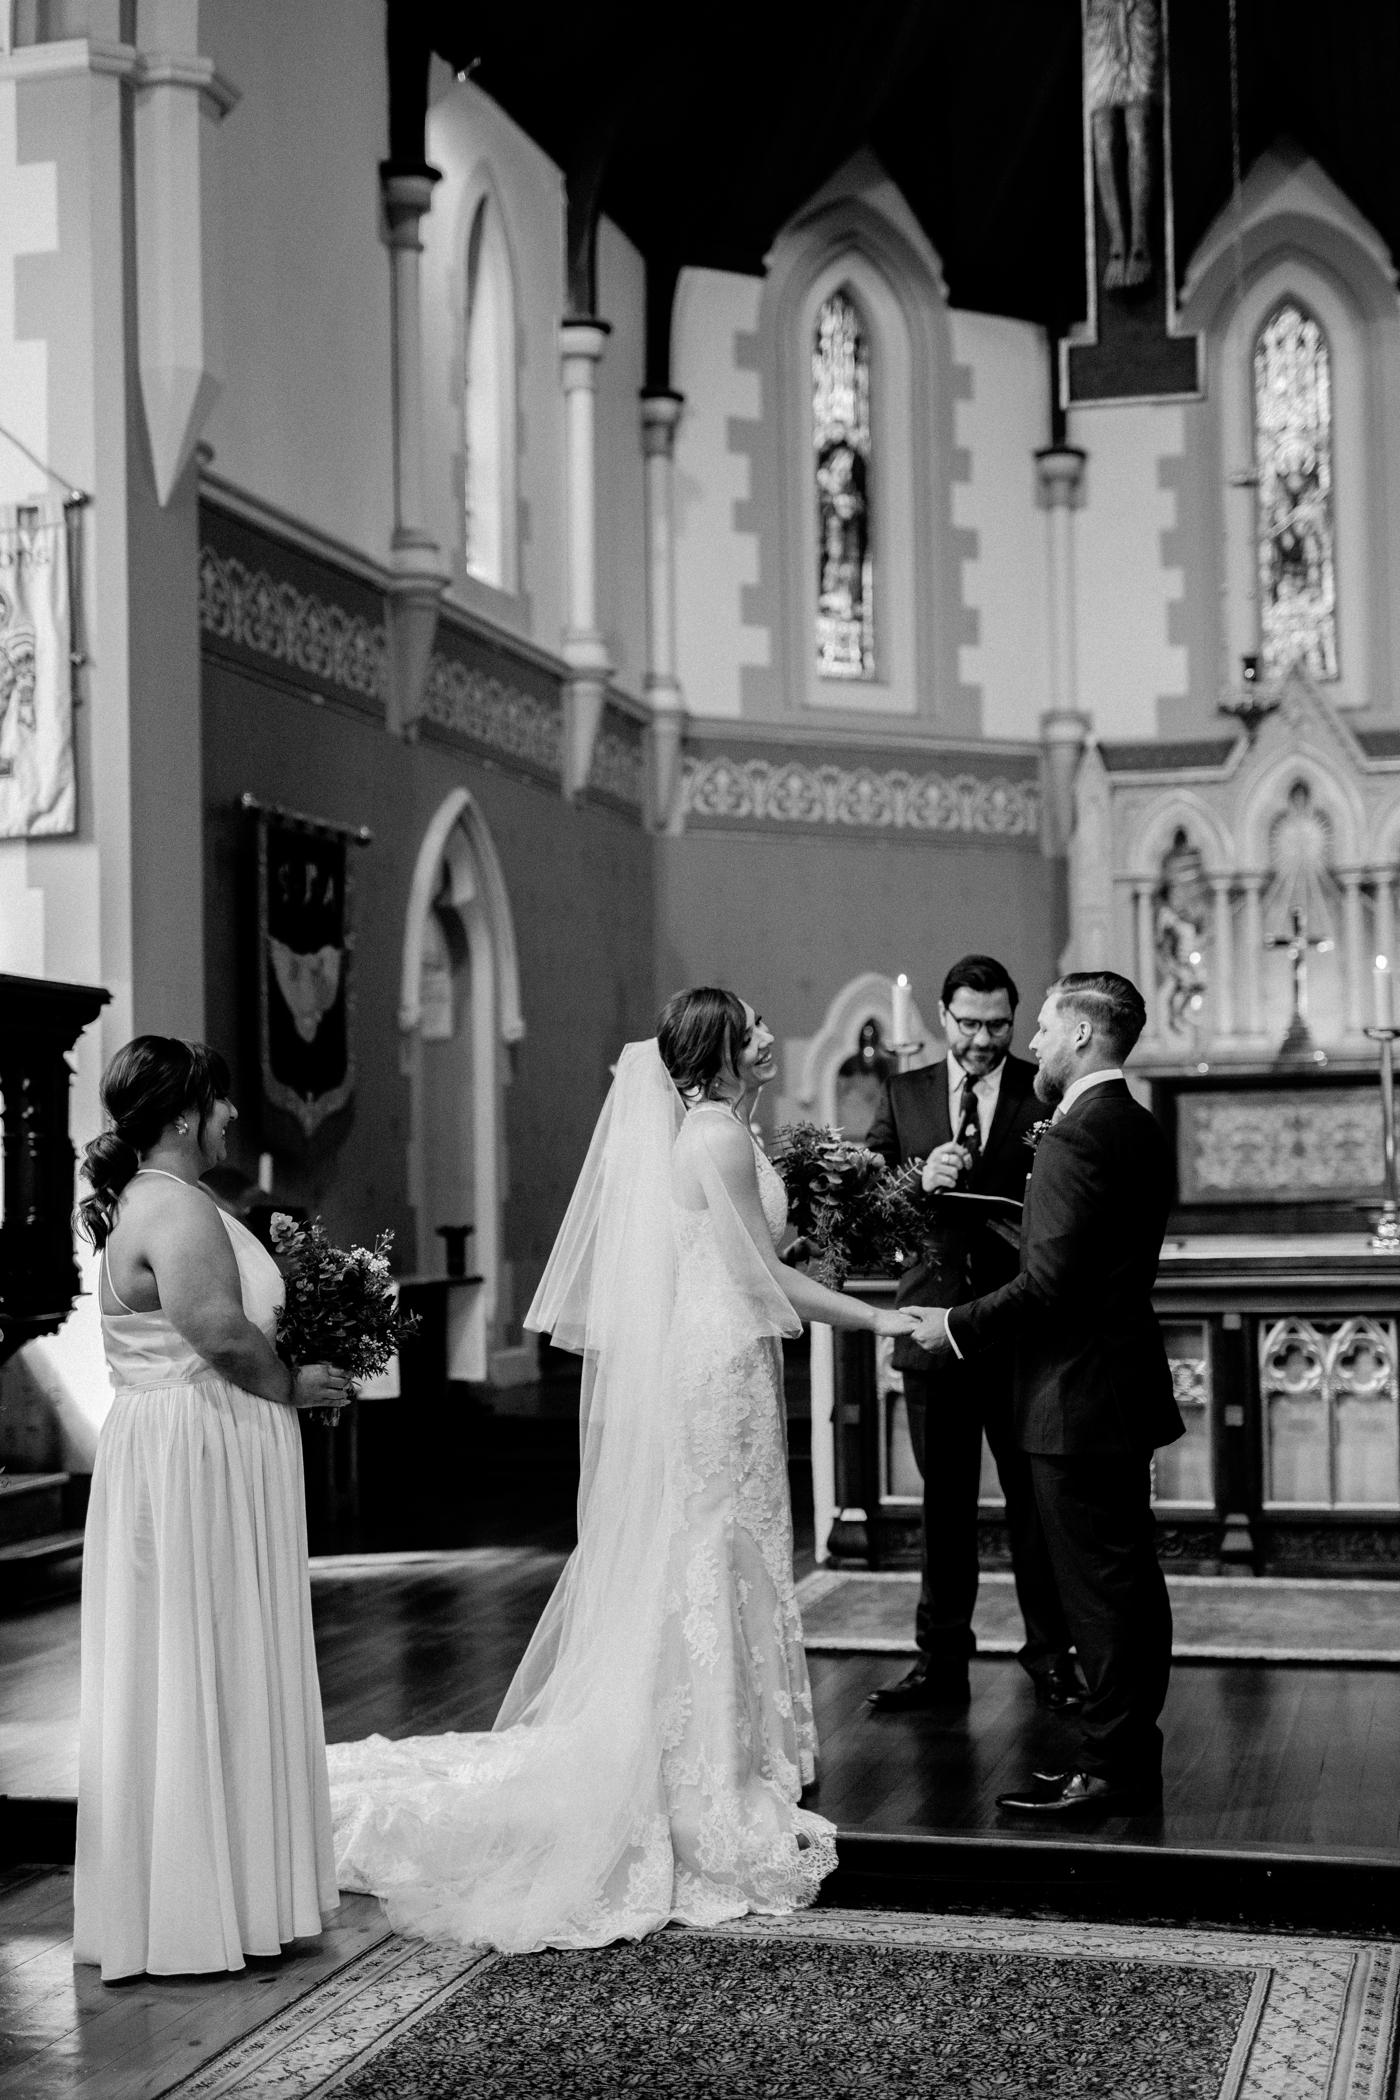 Erin & Ryan - Natural Wedding Photographer in Adelaide - Maximillians Wedding - Simple and Modern Wedding Photographer - Katherine Schultz - www.katherineschultzphotography.com_0015.jpg